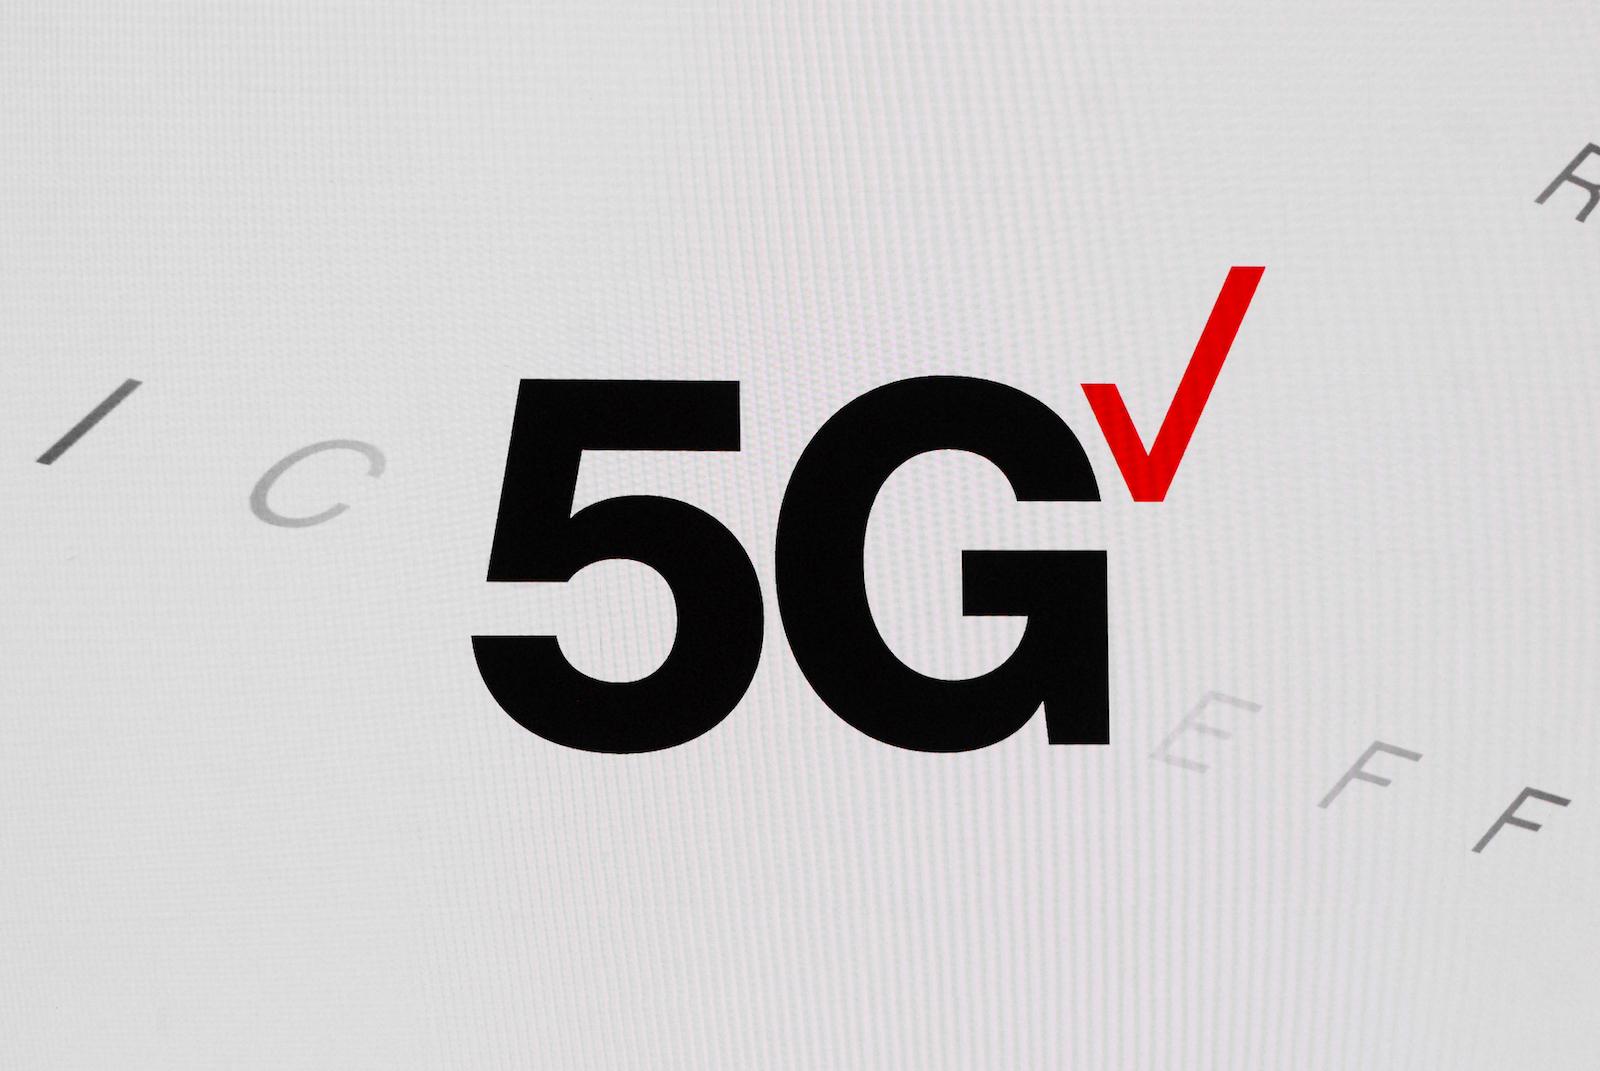 5G Verizon logotype showed during the Mobile World Congress (MWC) Barcelona, on June 28,2021 in Barcelona, Spain.  (Photo by Joan Cros/NurPhoto)